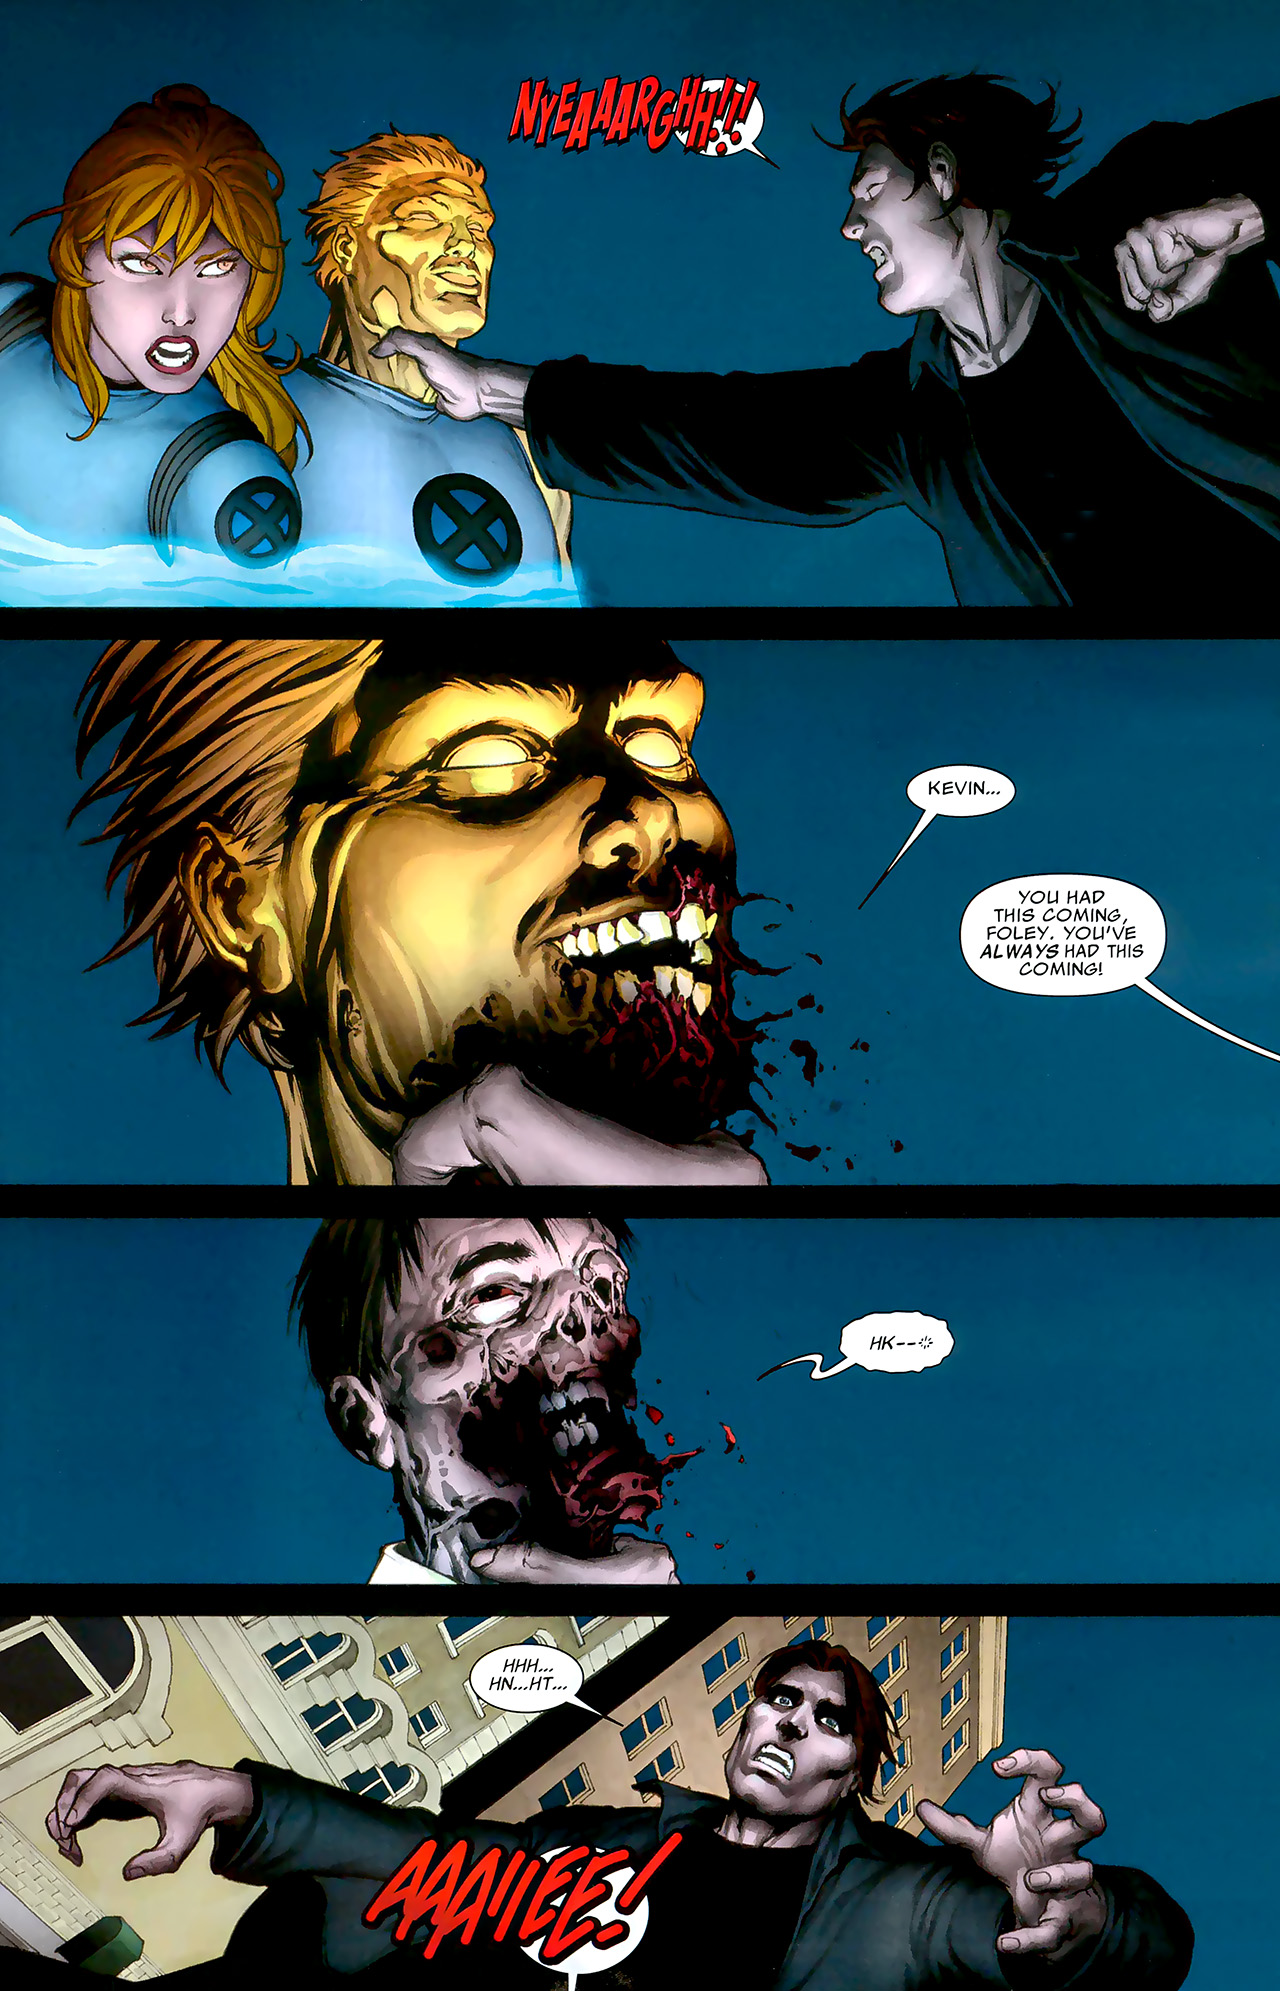 Read online X Necrosha: The Gathering comic -  Issue # Full - 9